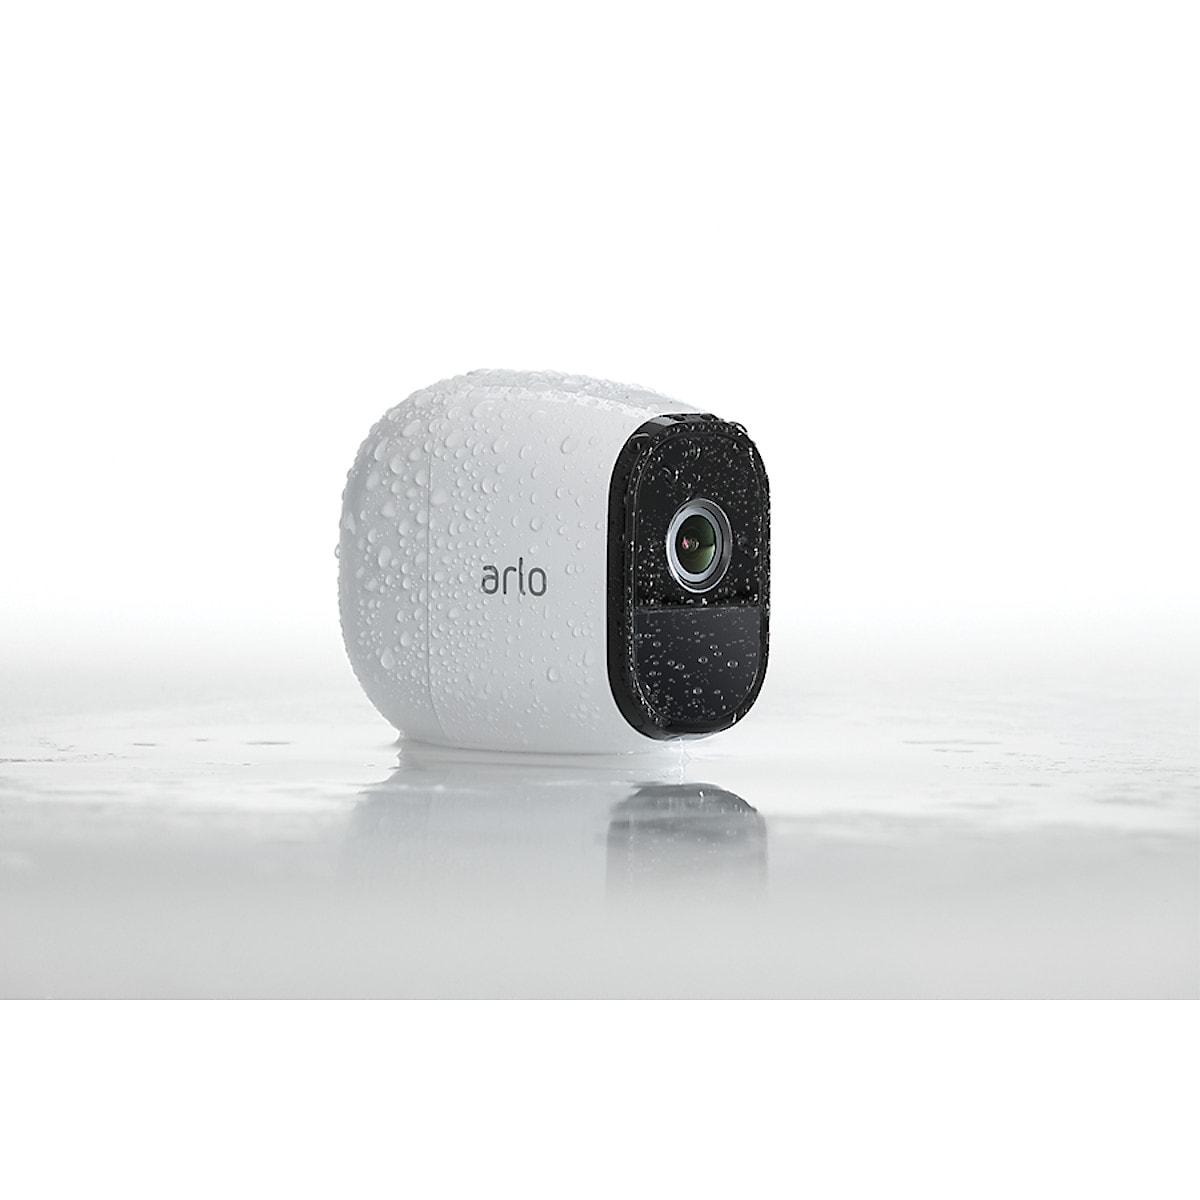 Überwachungskamera Netgear Arlo Pro